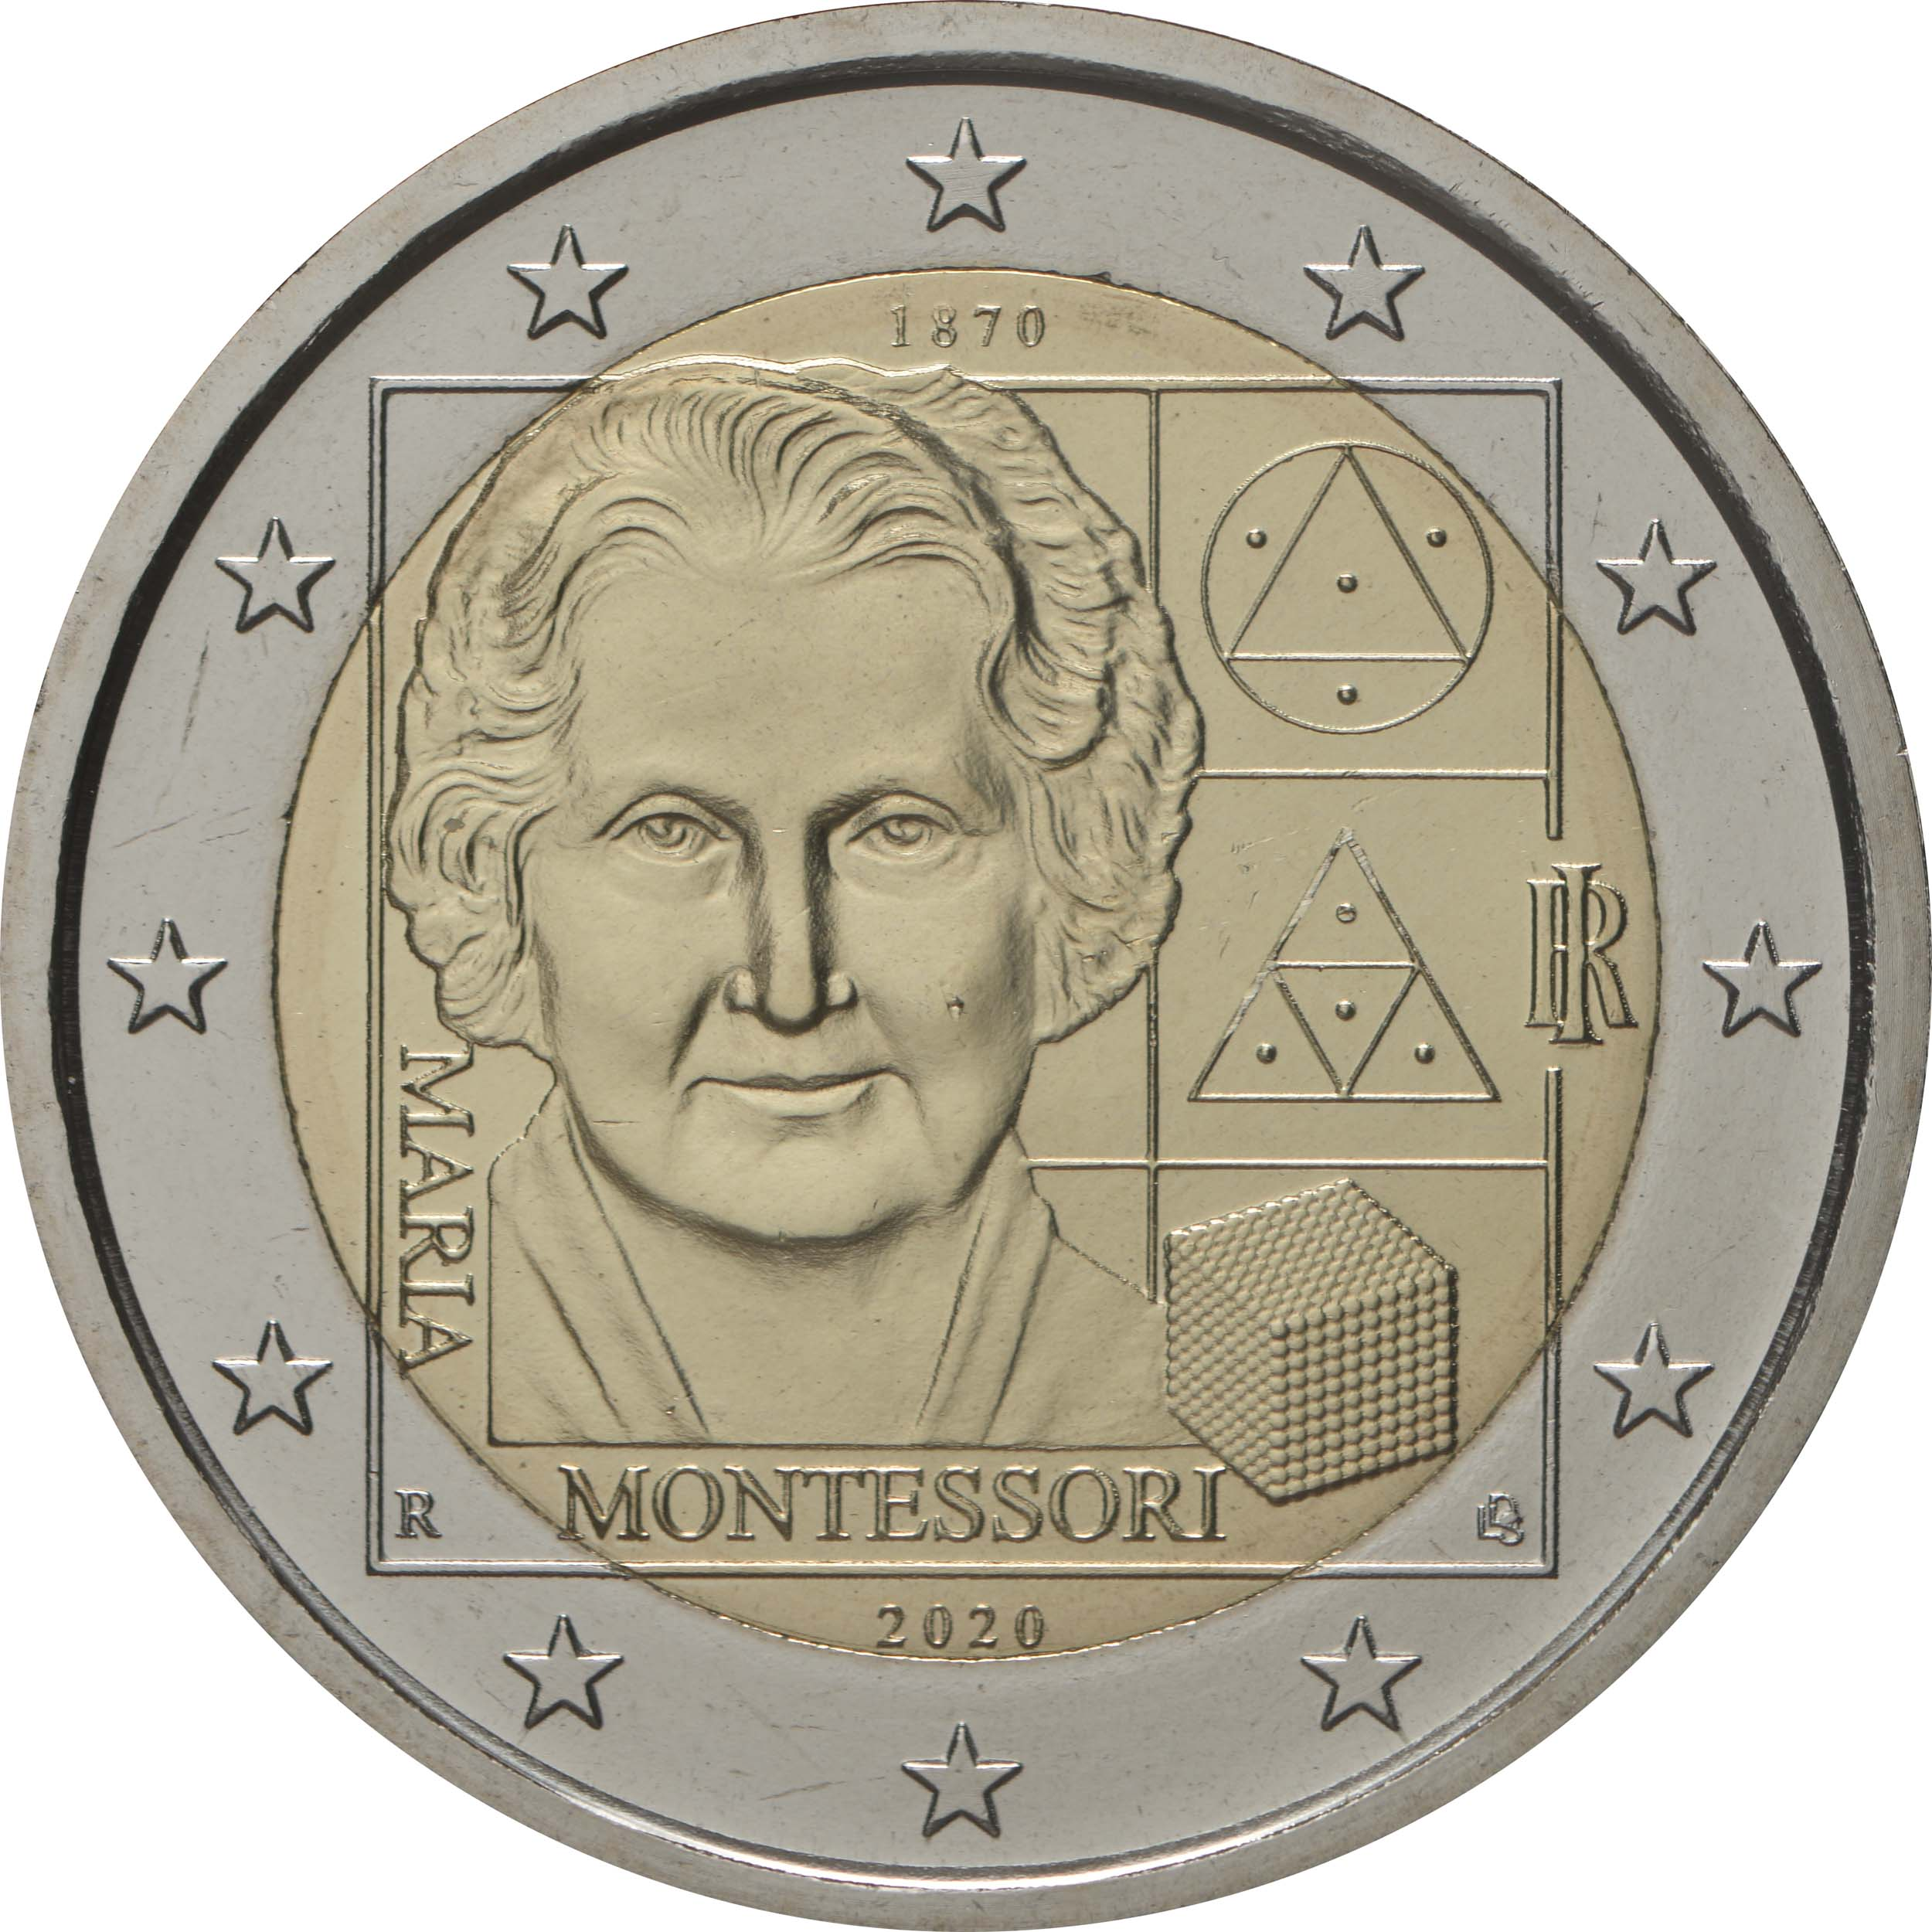 2020 374 Italien Montessori.jpg